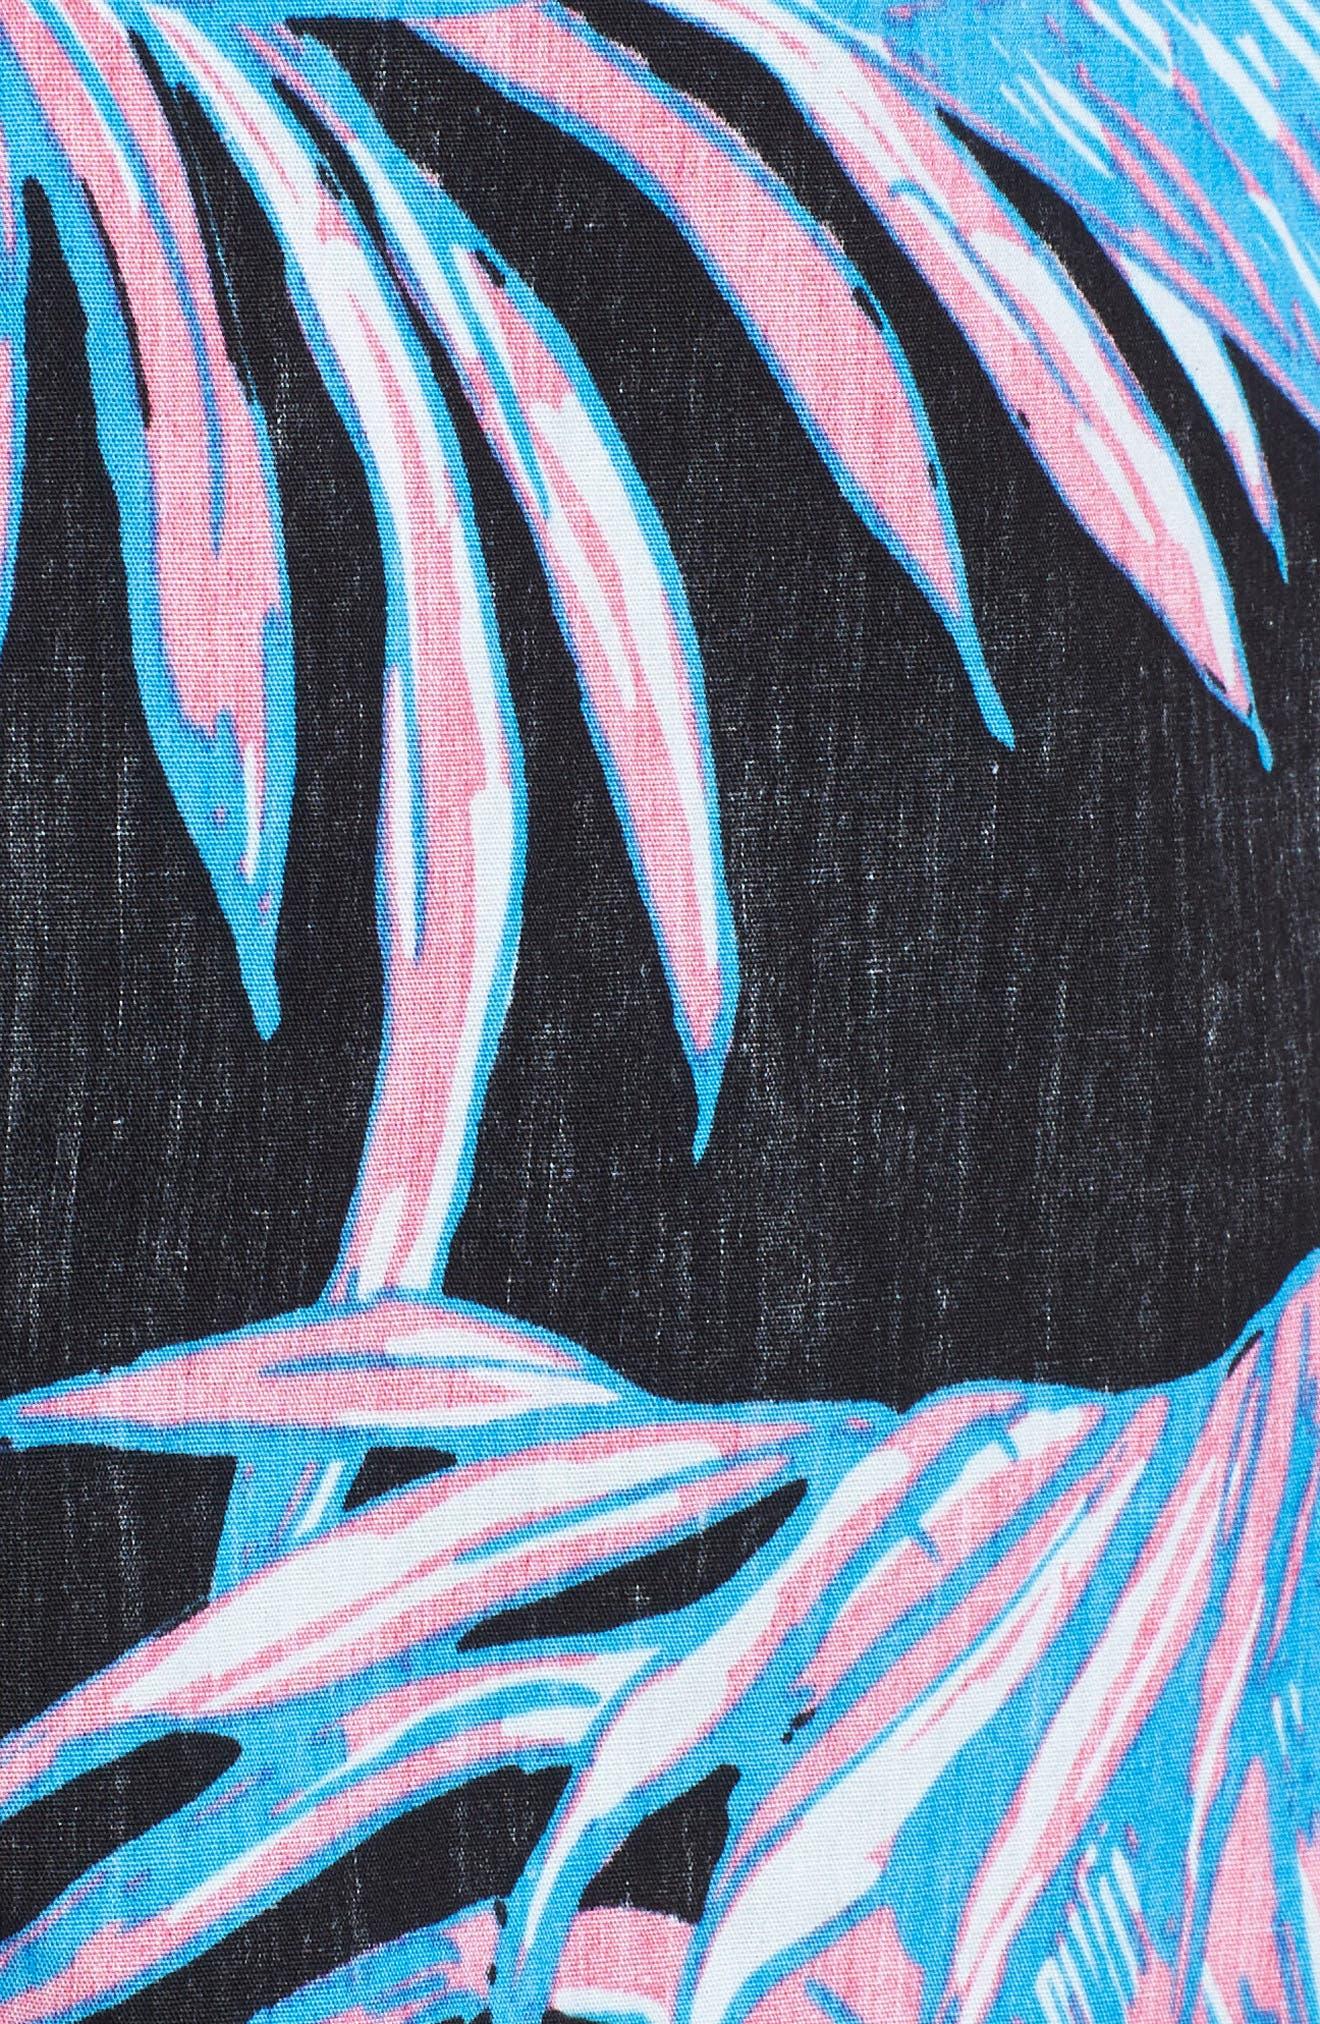 Koko Shirt,                             Alternate thumbnail 5, color,                             010